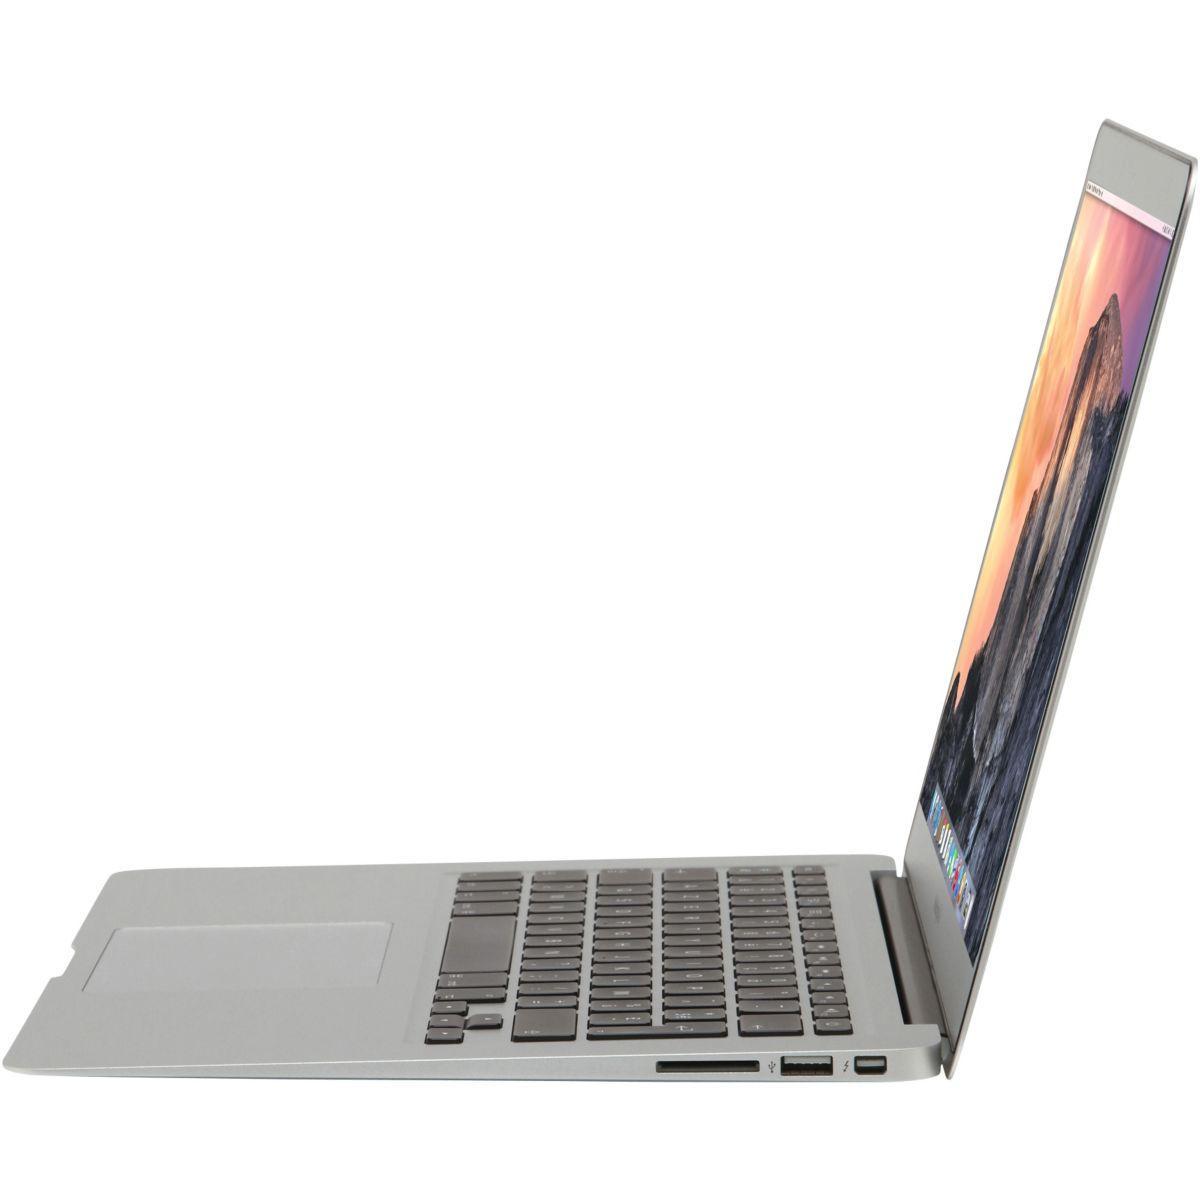 macbook air 13 core i7 5650u 2 2 ghz ssd 512 go ram 8 go reconditionn back market. Black Bedroom Furniture Sets. Home Design Ideas